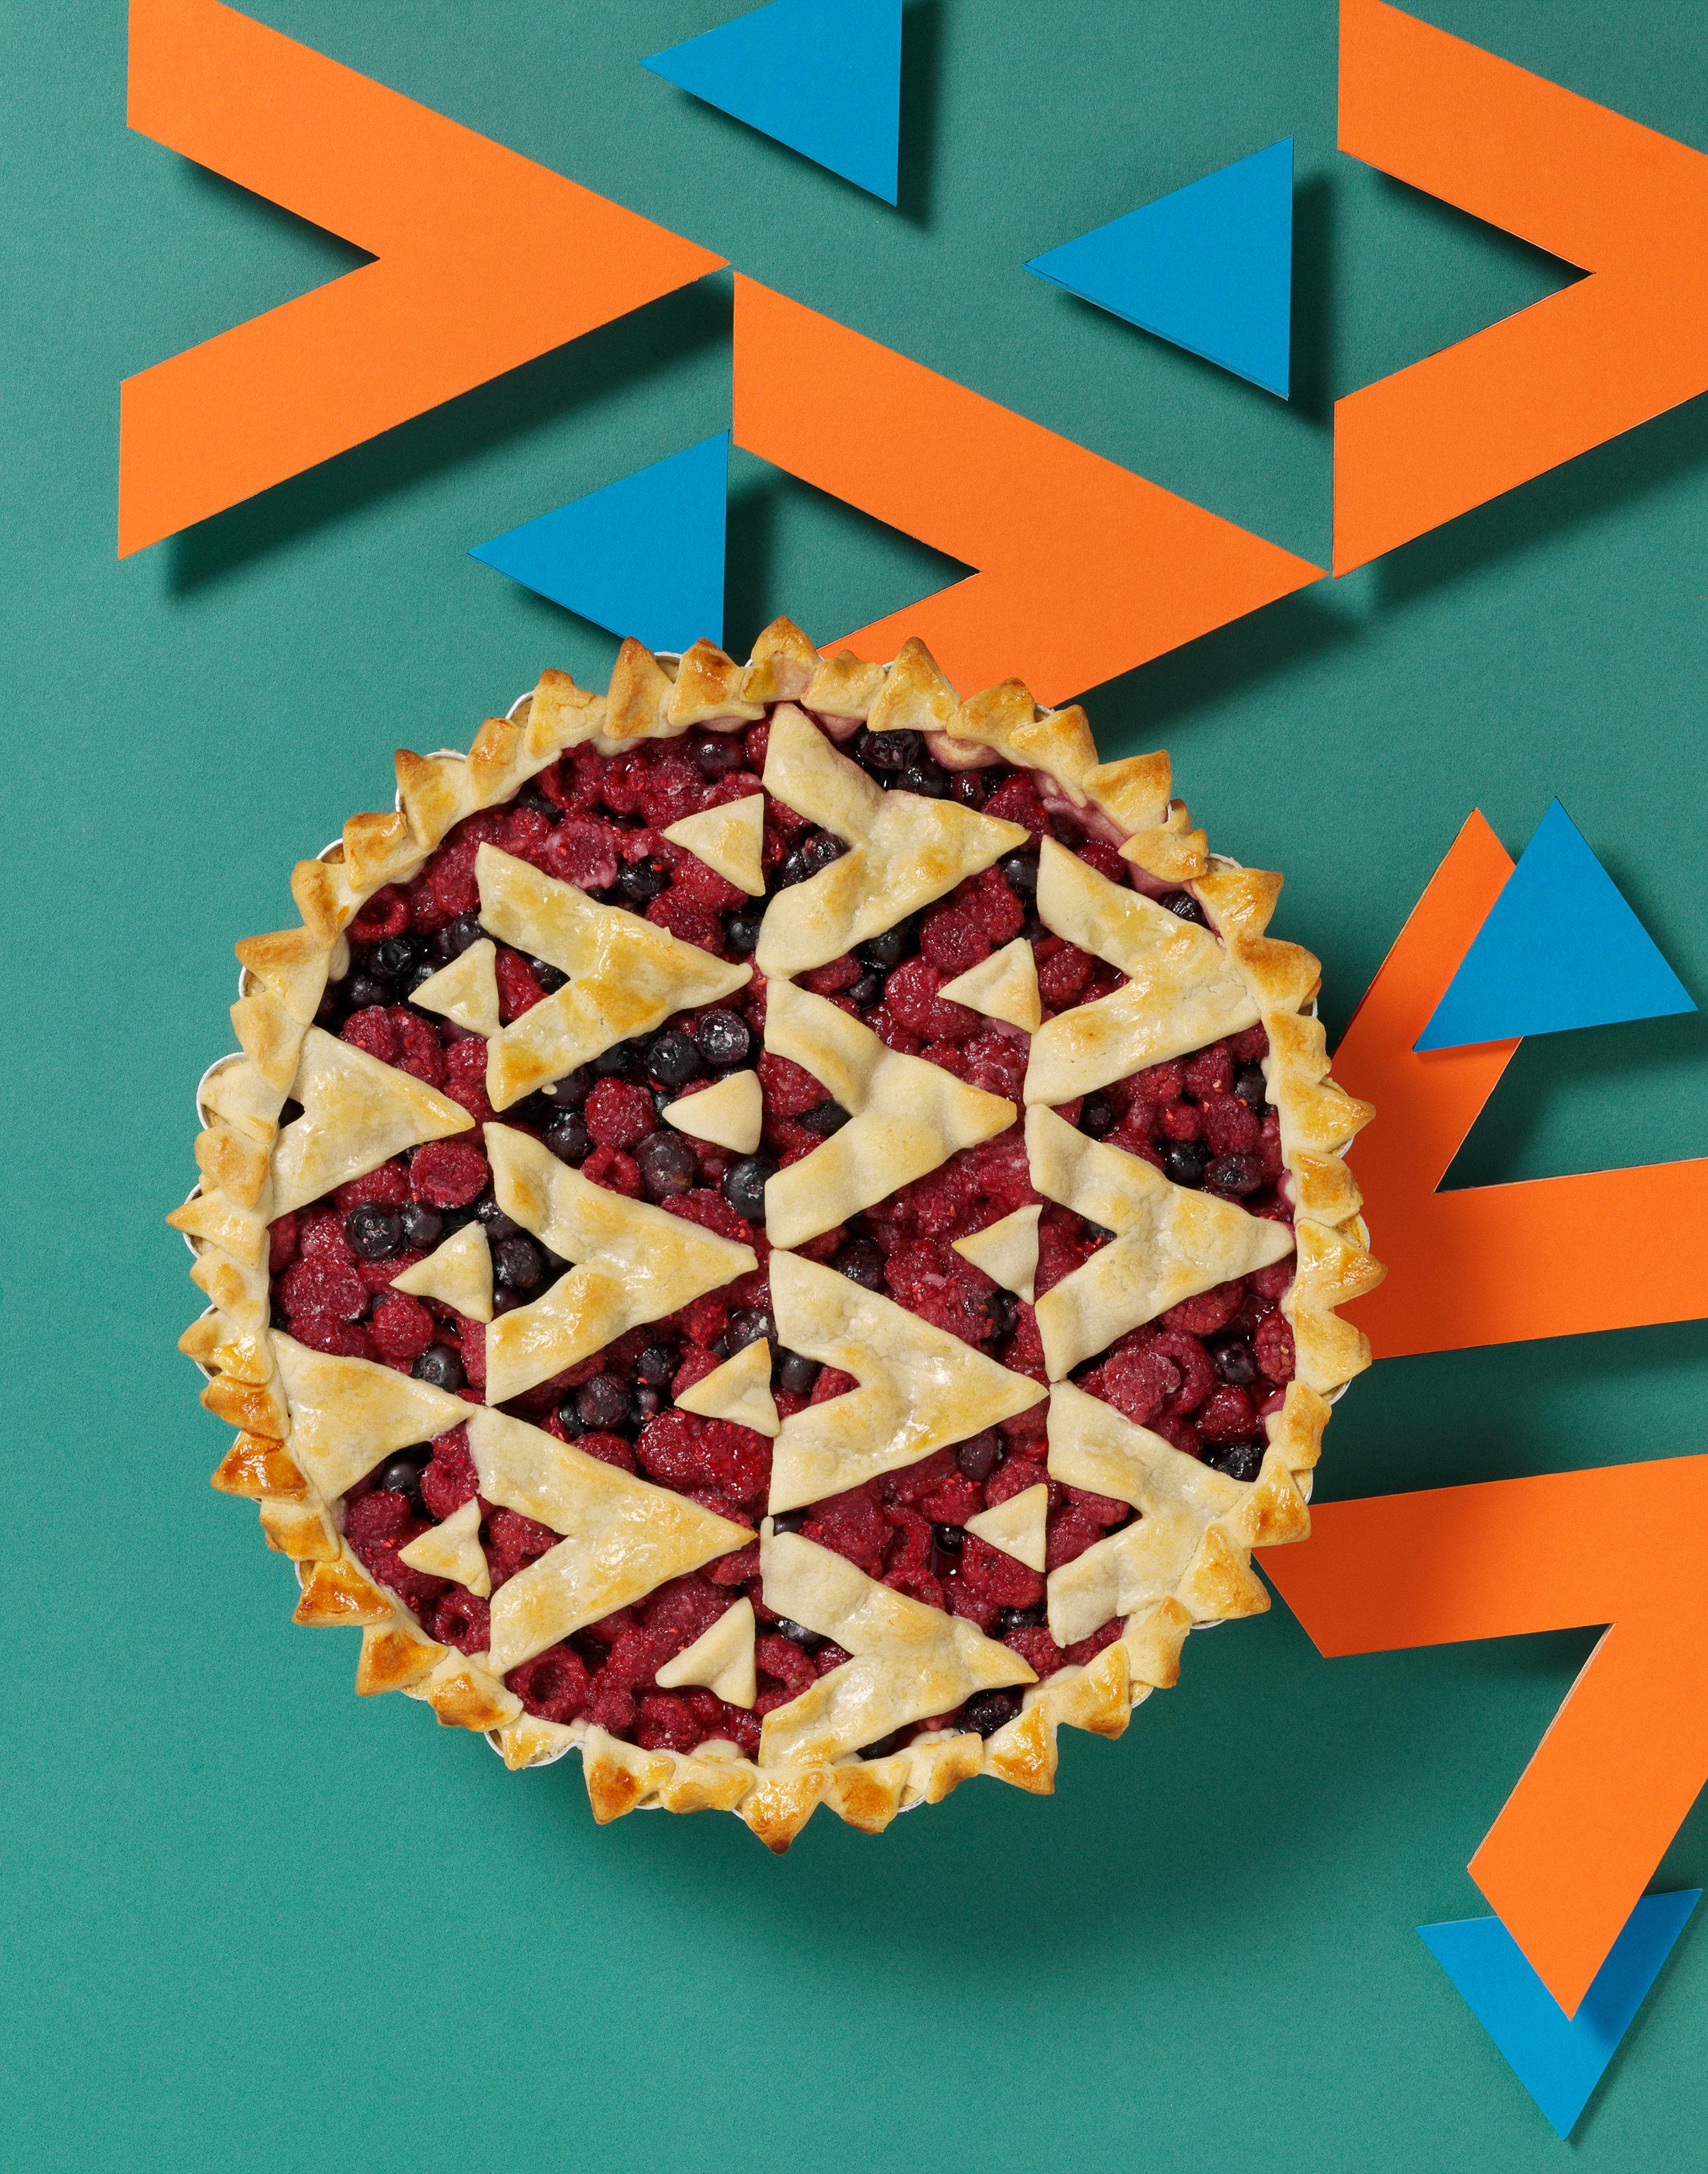 Cubed Pie Mixed Berry RET11x14HR.jpg